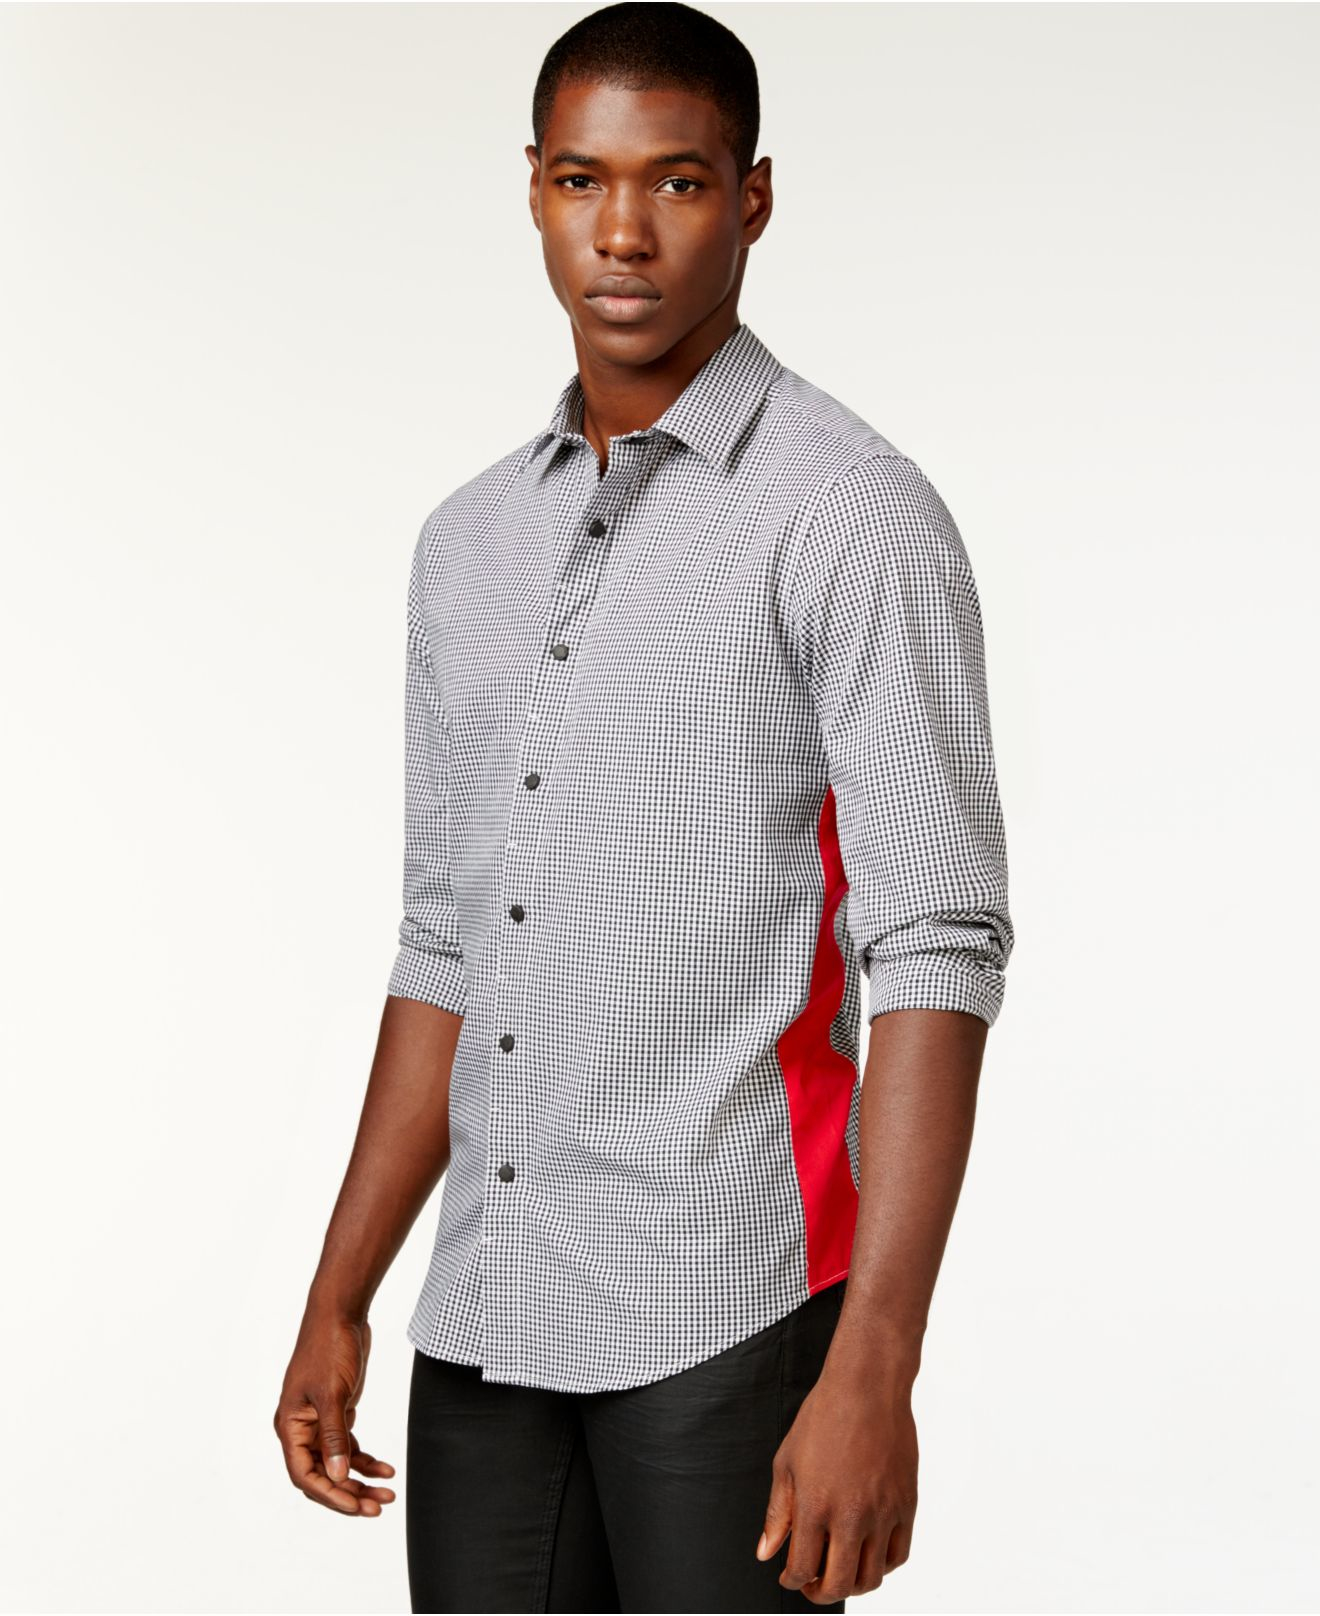 Lyst sean john men 39 s gingham contrast side shirt in for Sean john t shirts for mens